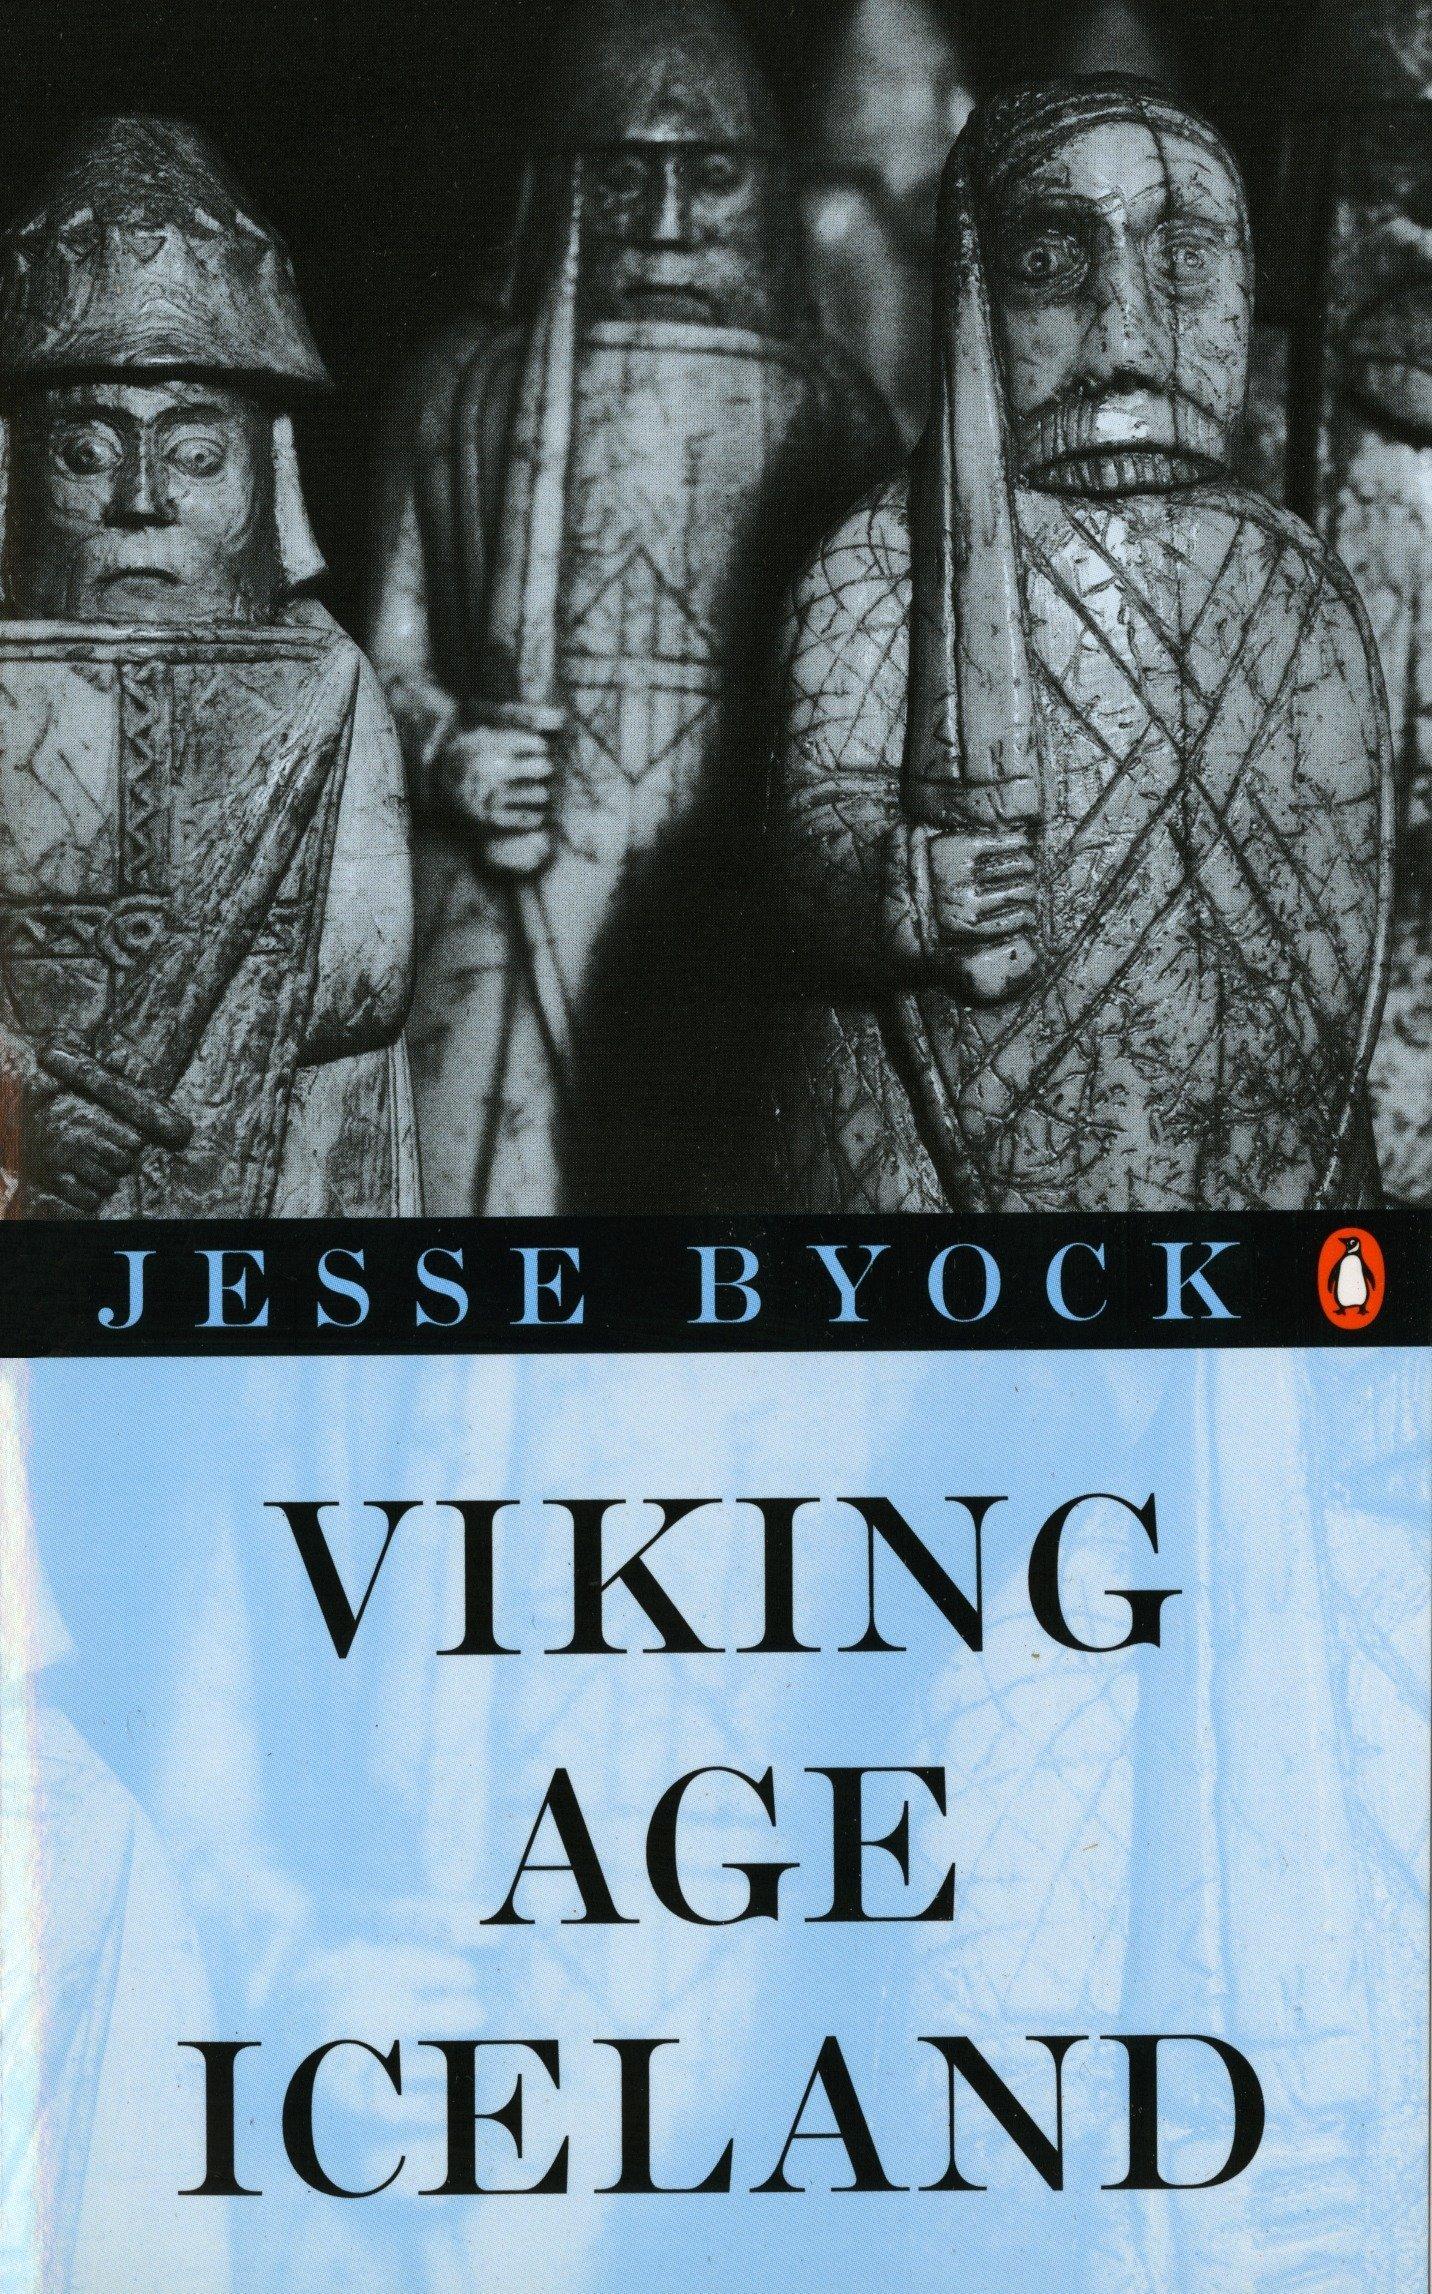 Viking Age Iceland: Amazon.es: Byock, Jesse: Libros en idiomas extranjeros